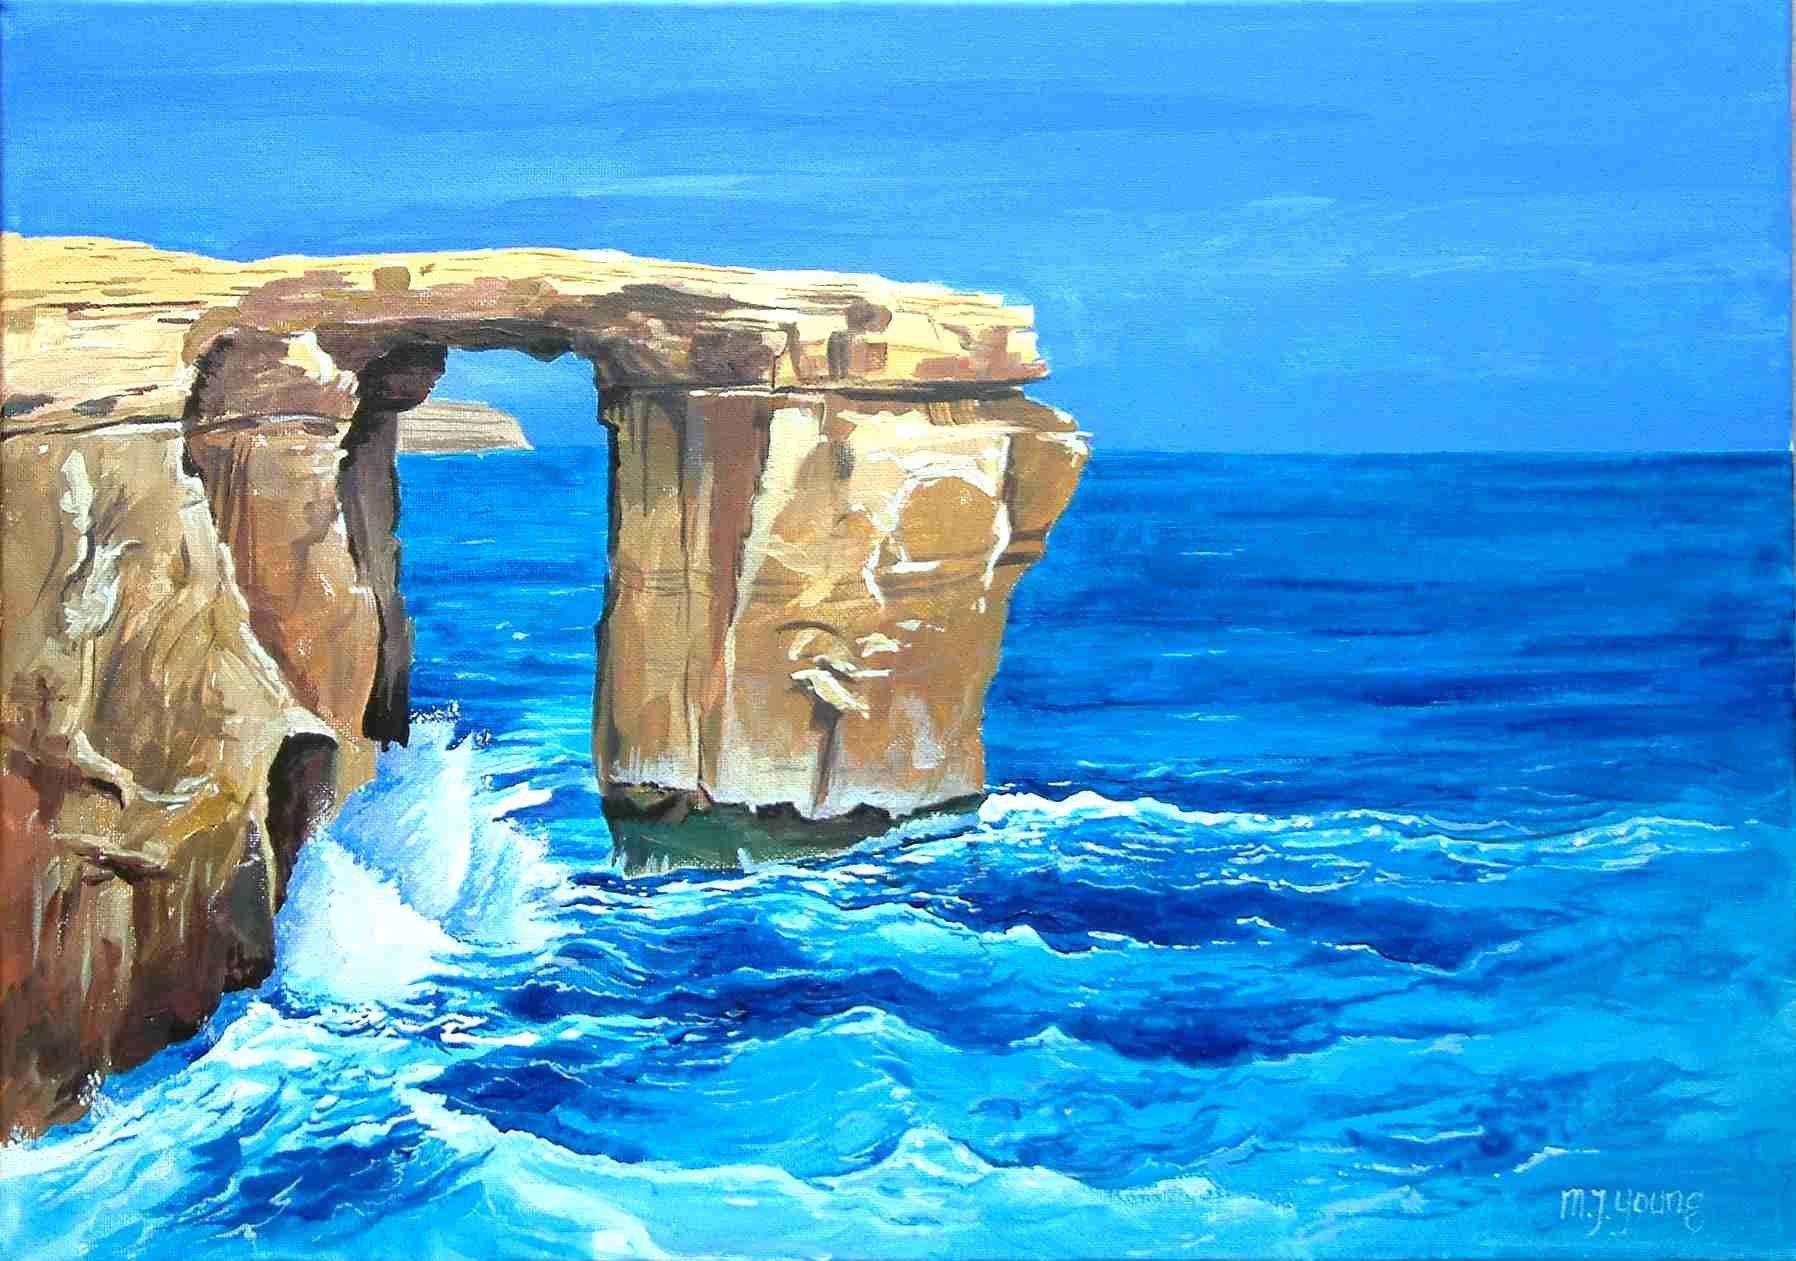 http://artbymart.blogsome.com/images/Gozo%20Nat%20Arch.jpg